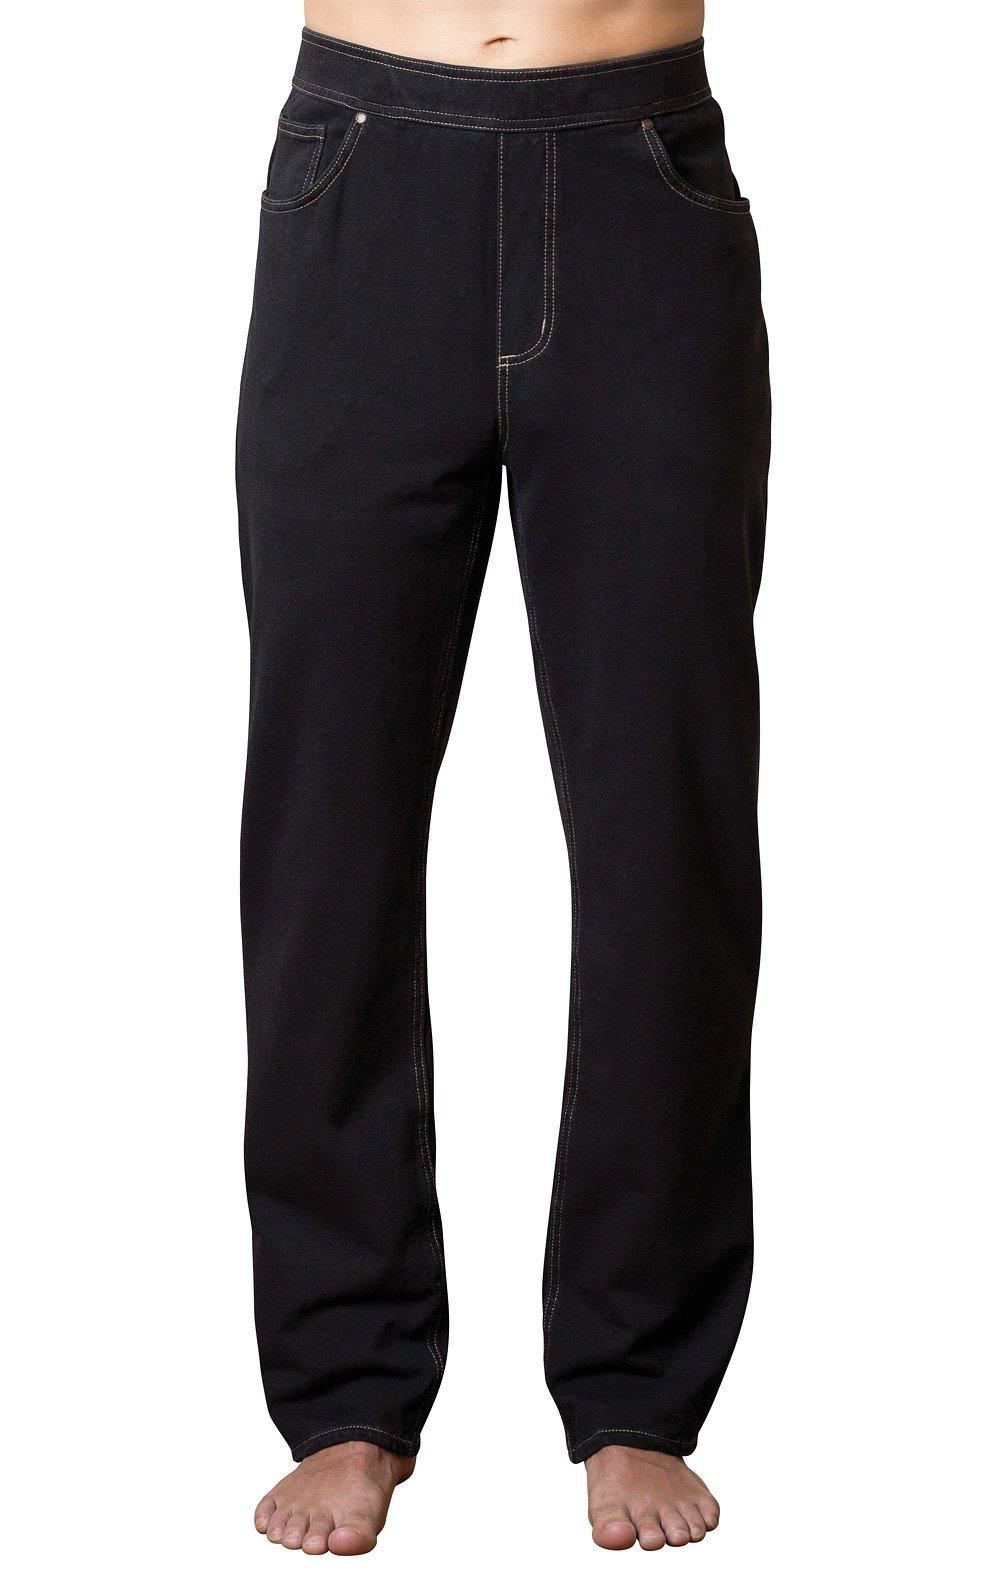 PajamaJeans Men's Straight Leg Knit Denim Jeans, Black, Medium by PajamaJeans